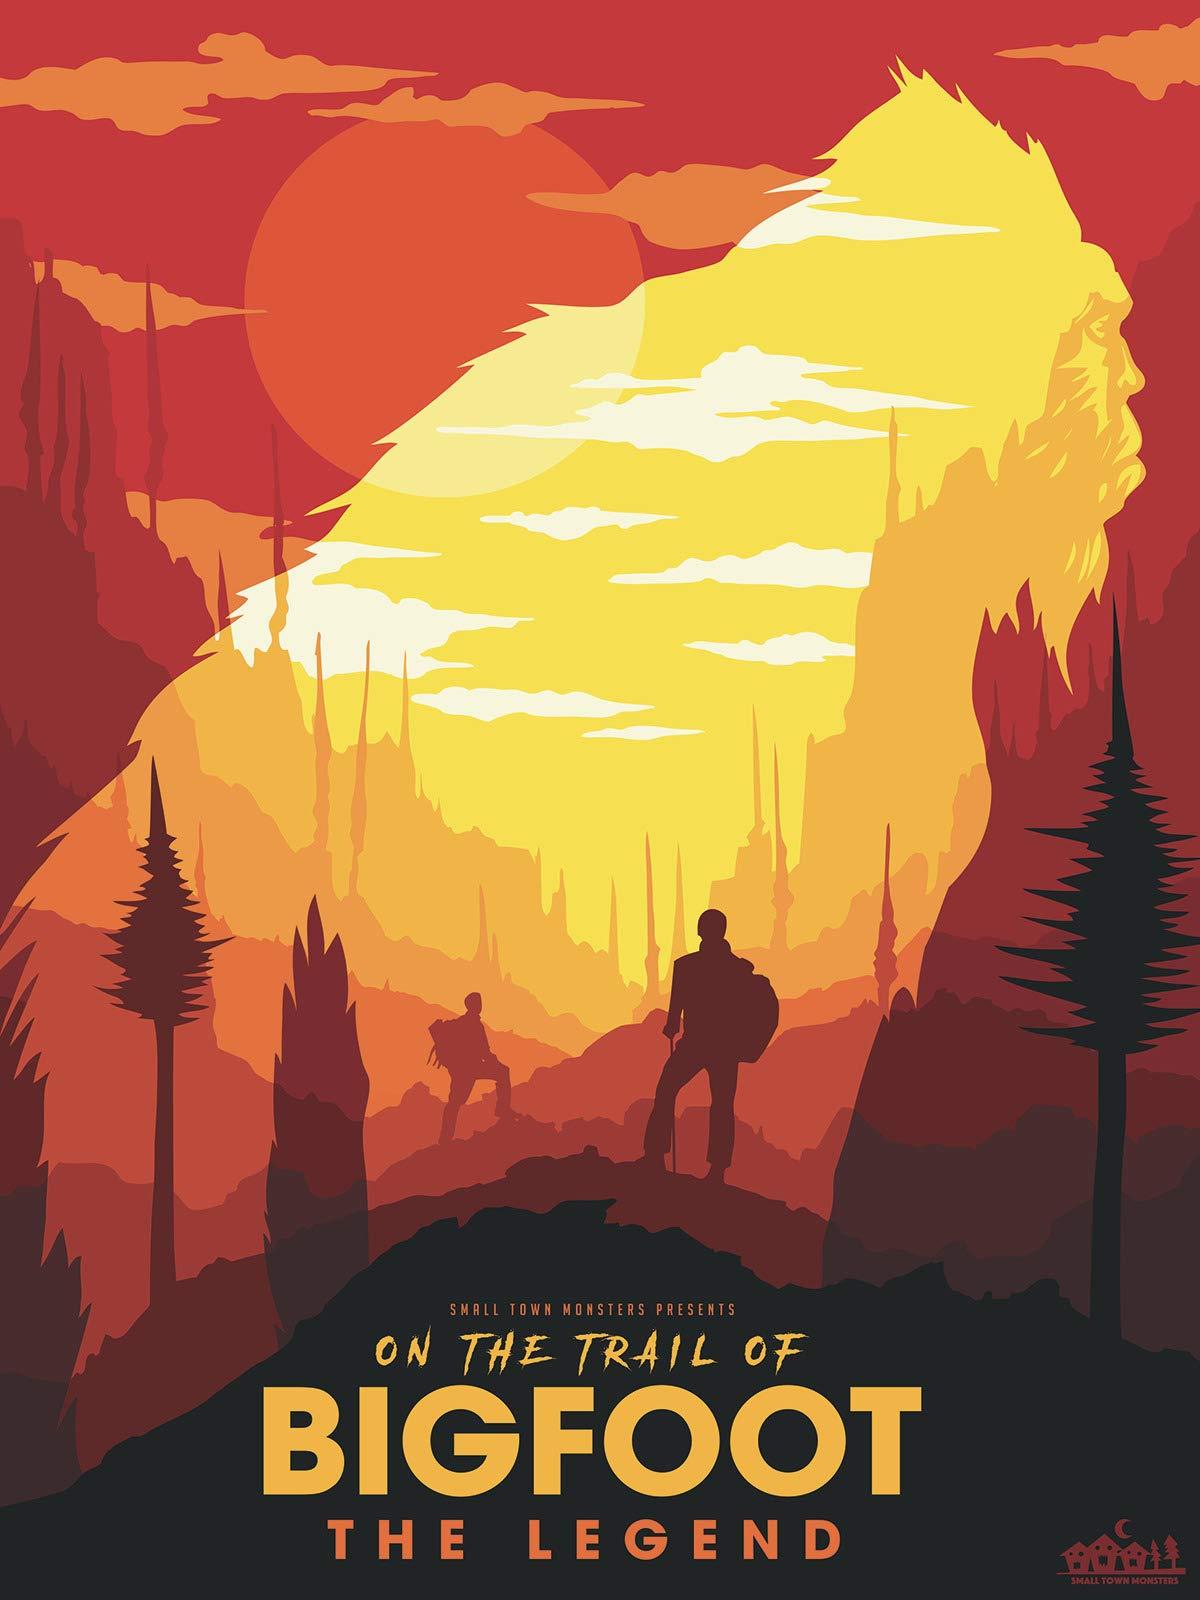 Amazon.com: On the Trail of Bigfoot: The Legend: Loren Coleman ...